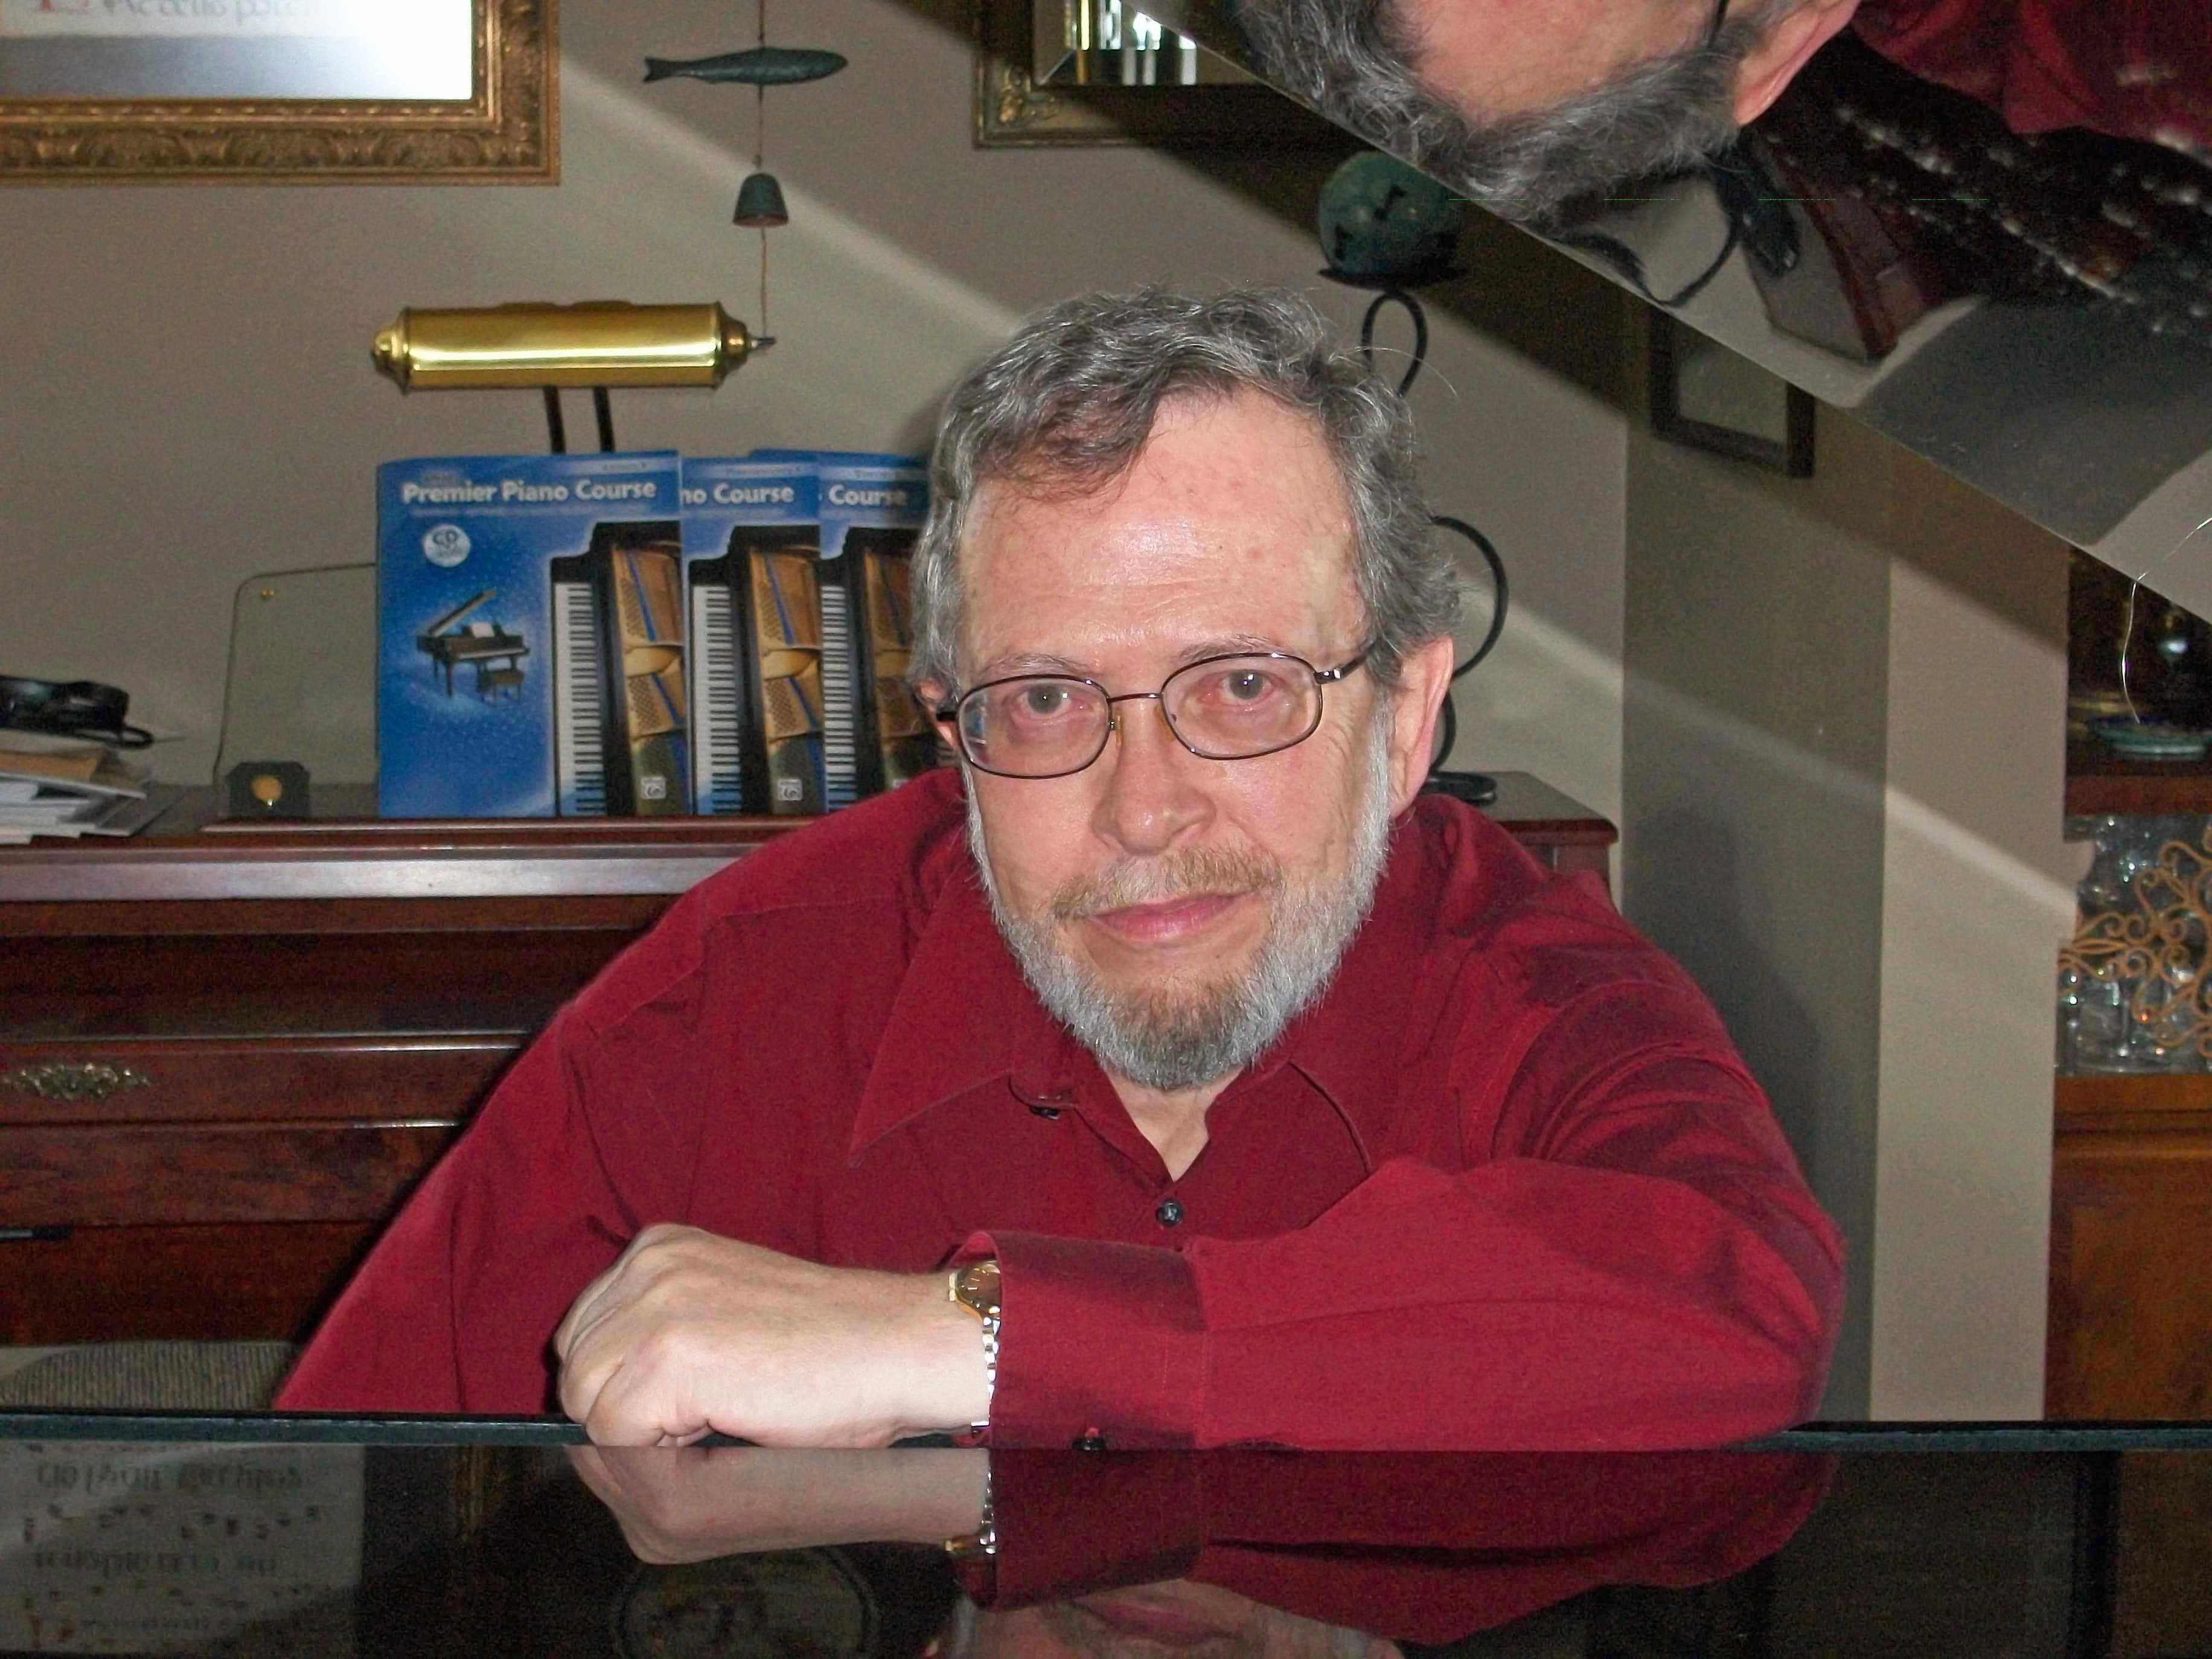 Grover Farr, music teacher sitting at piano